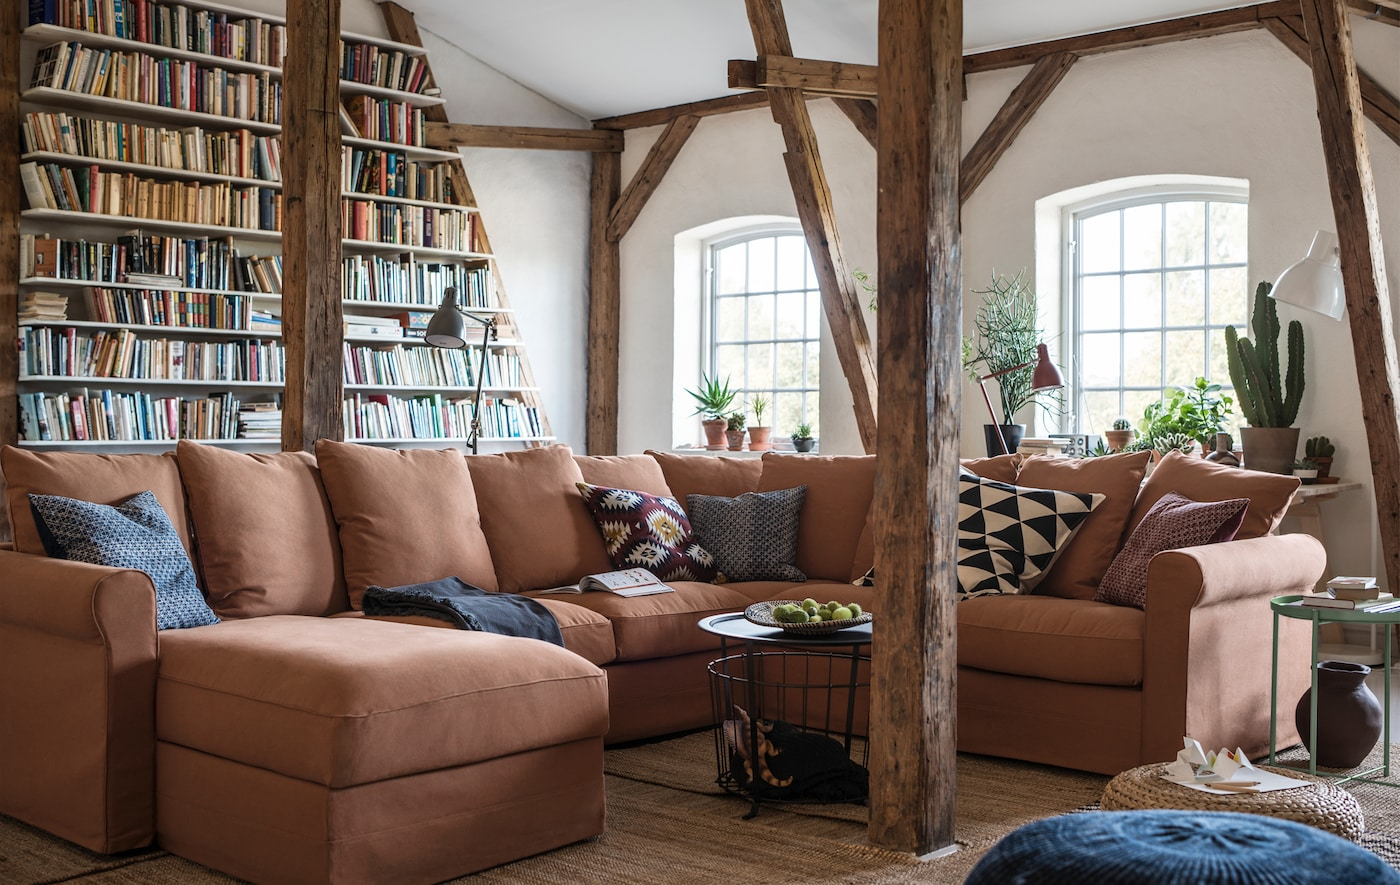 gr nlid sofa ideen f r dein zuhause ikea ikea. Black Bedroom Furniture Sets. Home Design Ideas